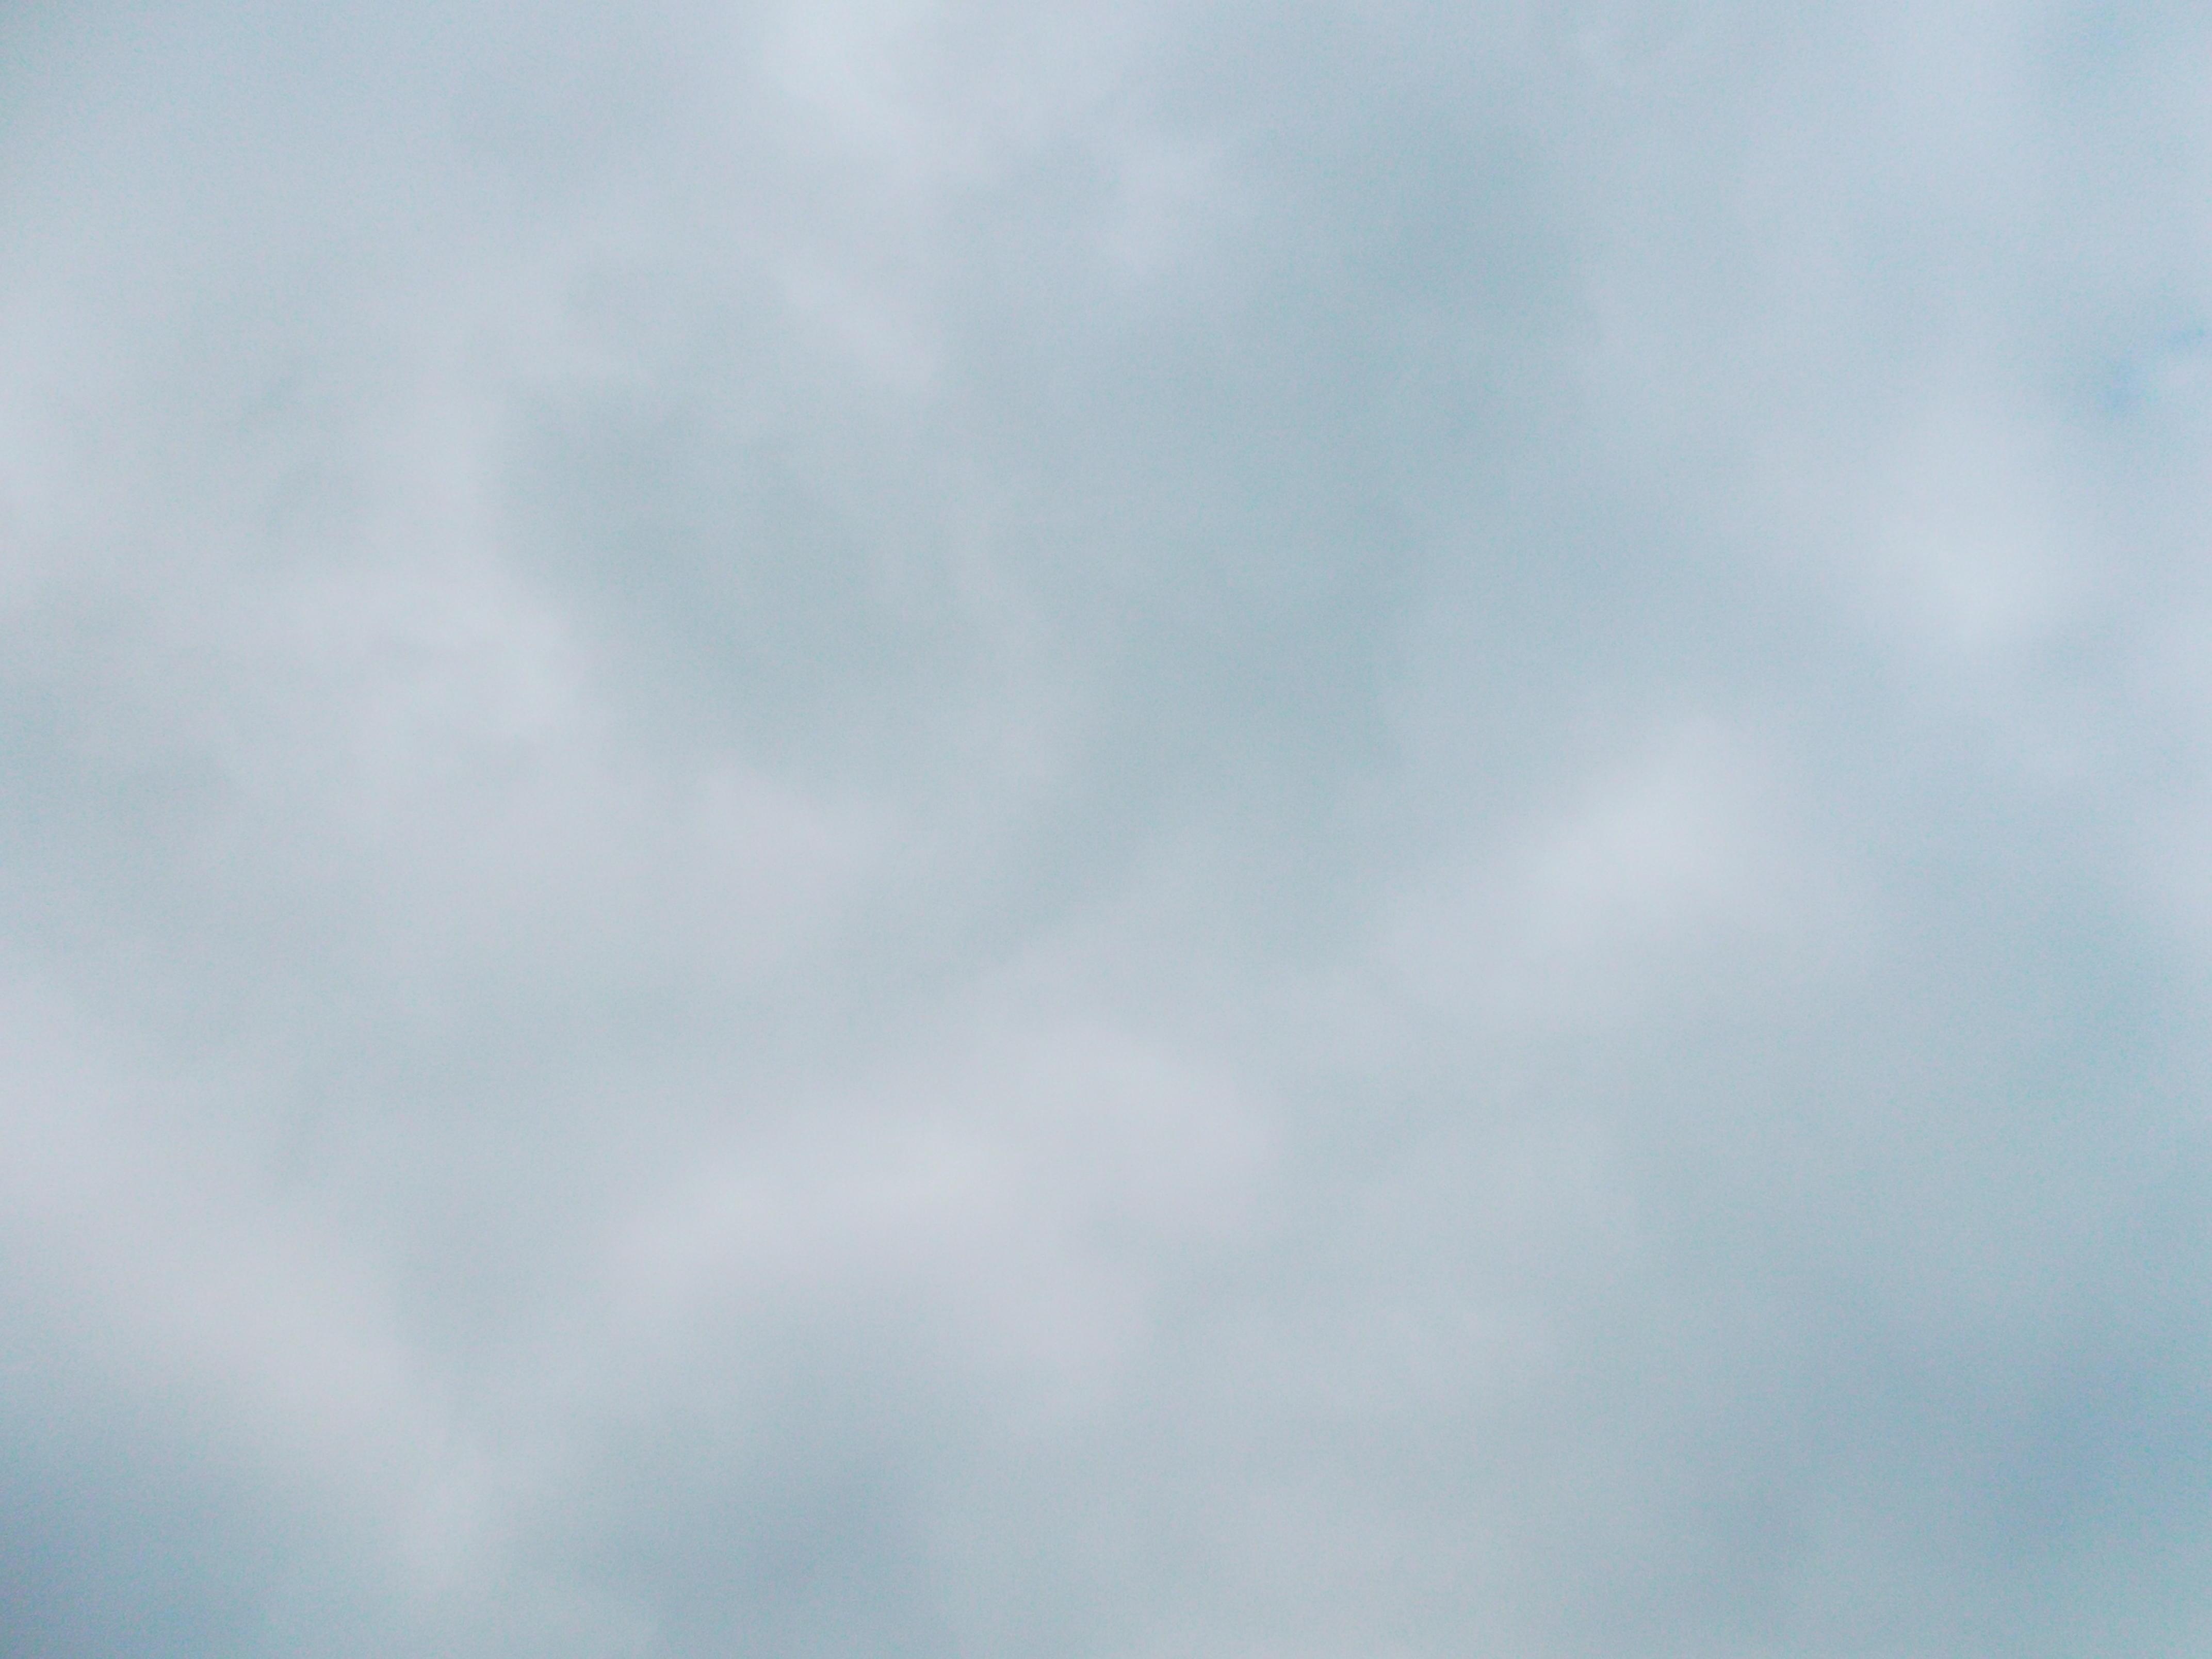 2013-02-22 Longitude -0.371 Latitude 49.182 Altitude 13 Heure 15h28